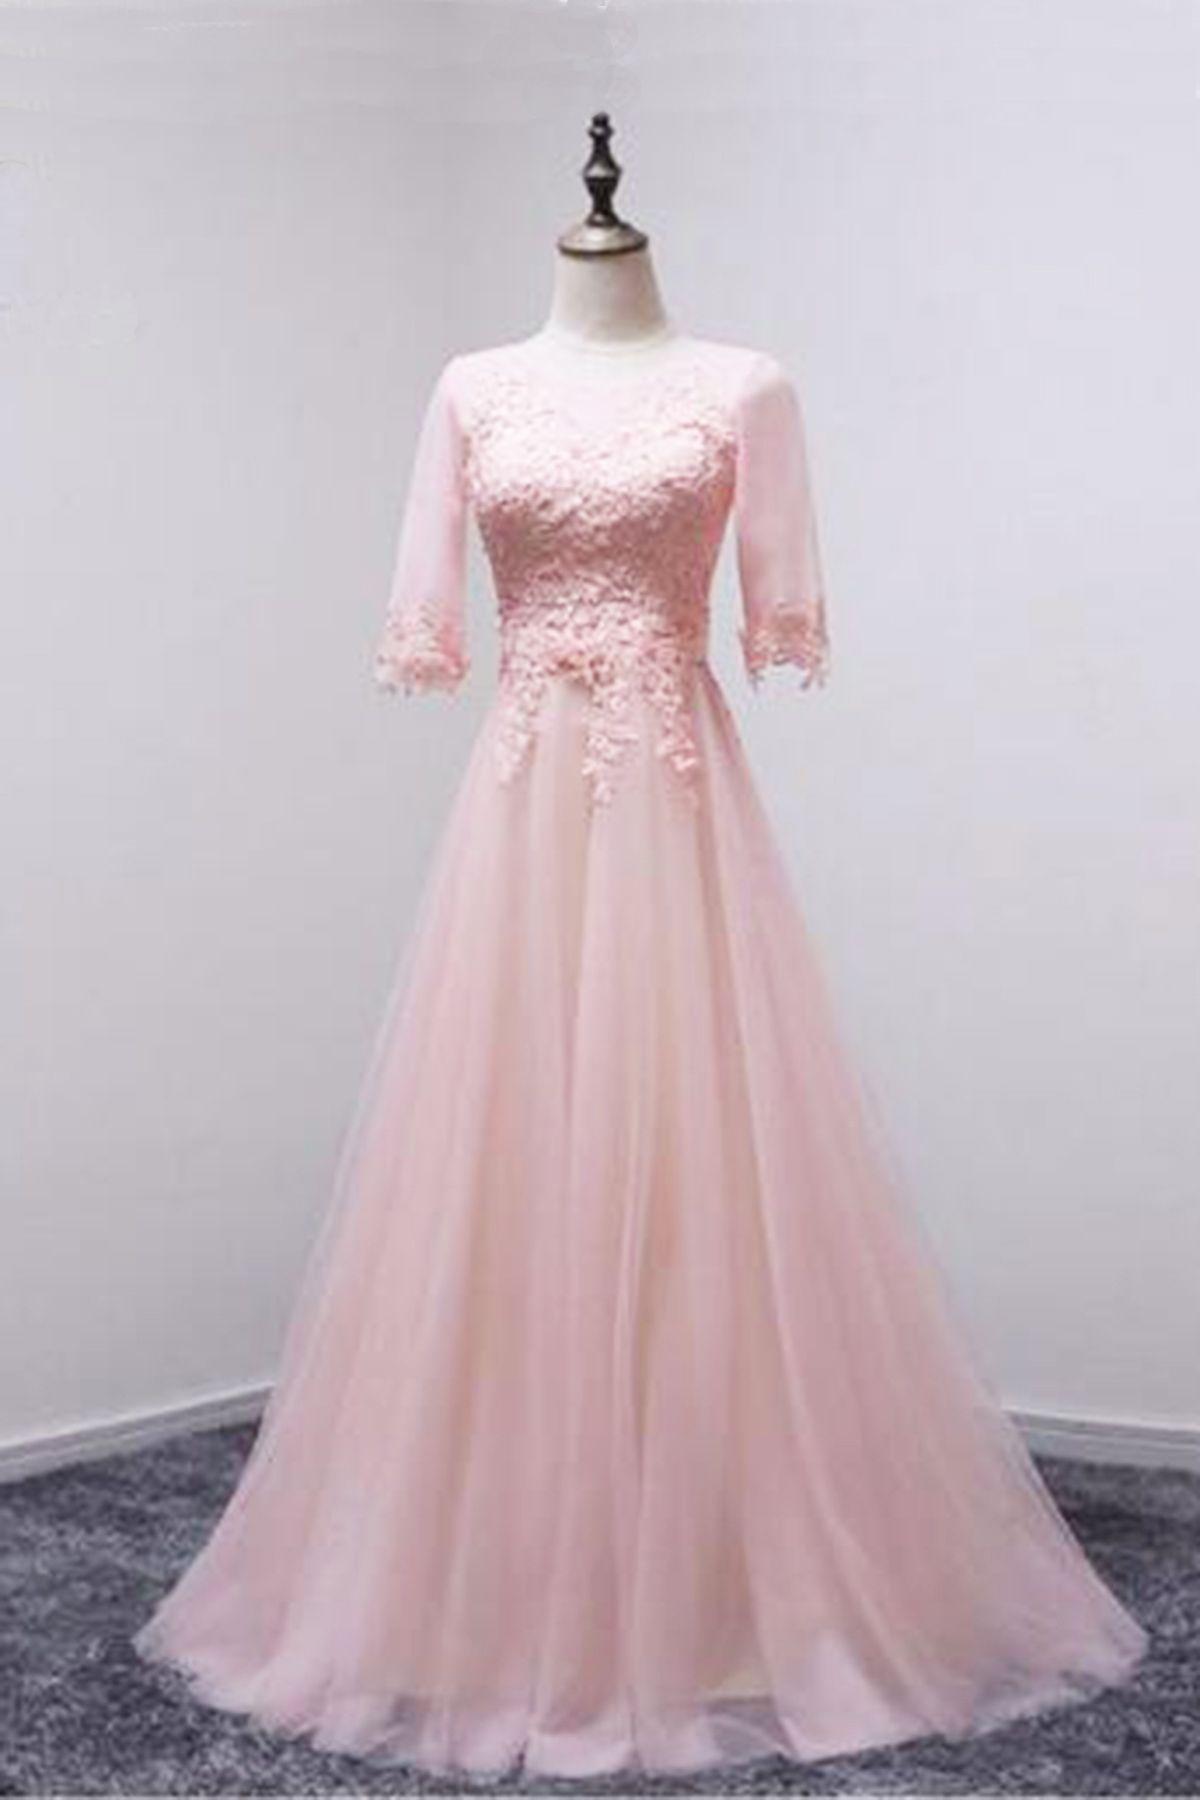 Pink tulle midsleeves long aline prom dress bridesmaid dress